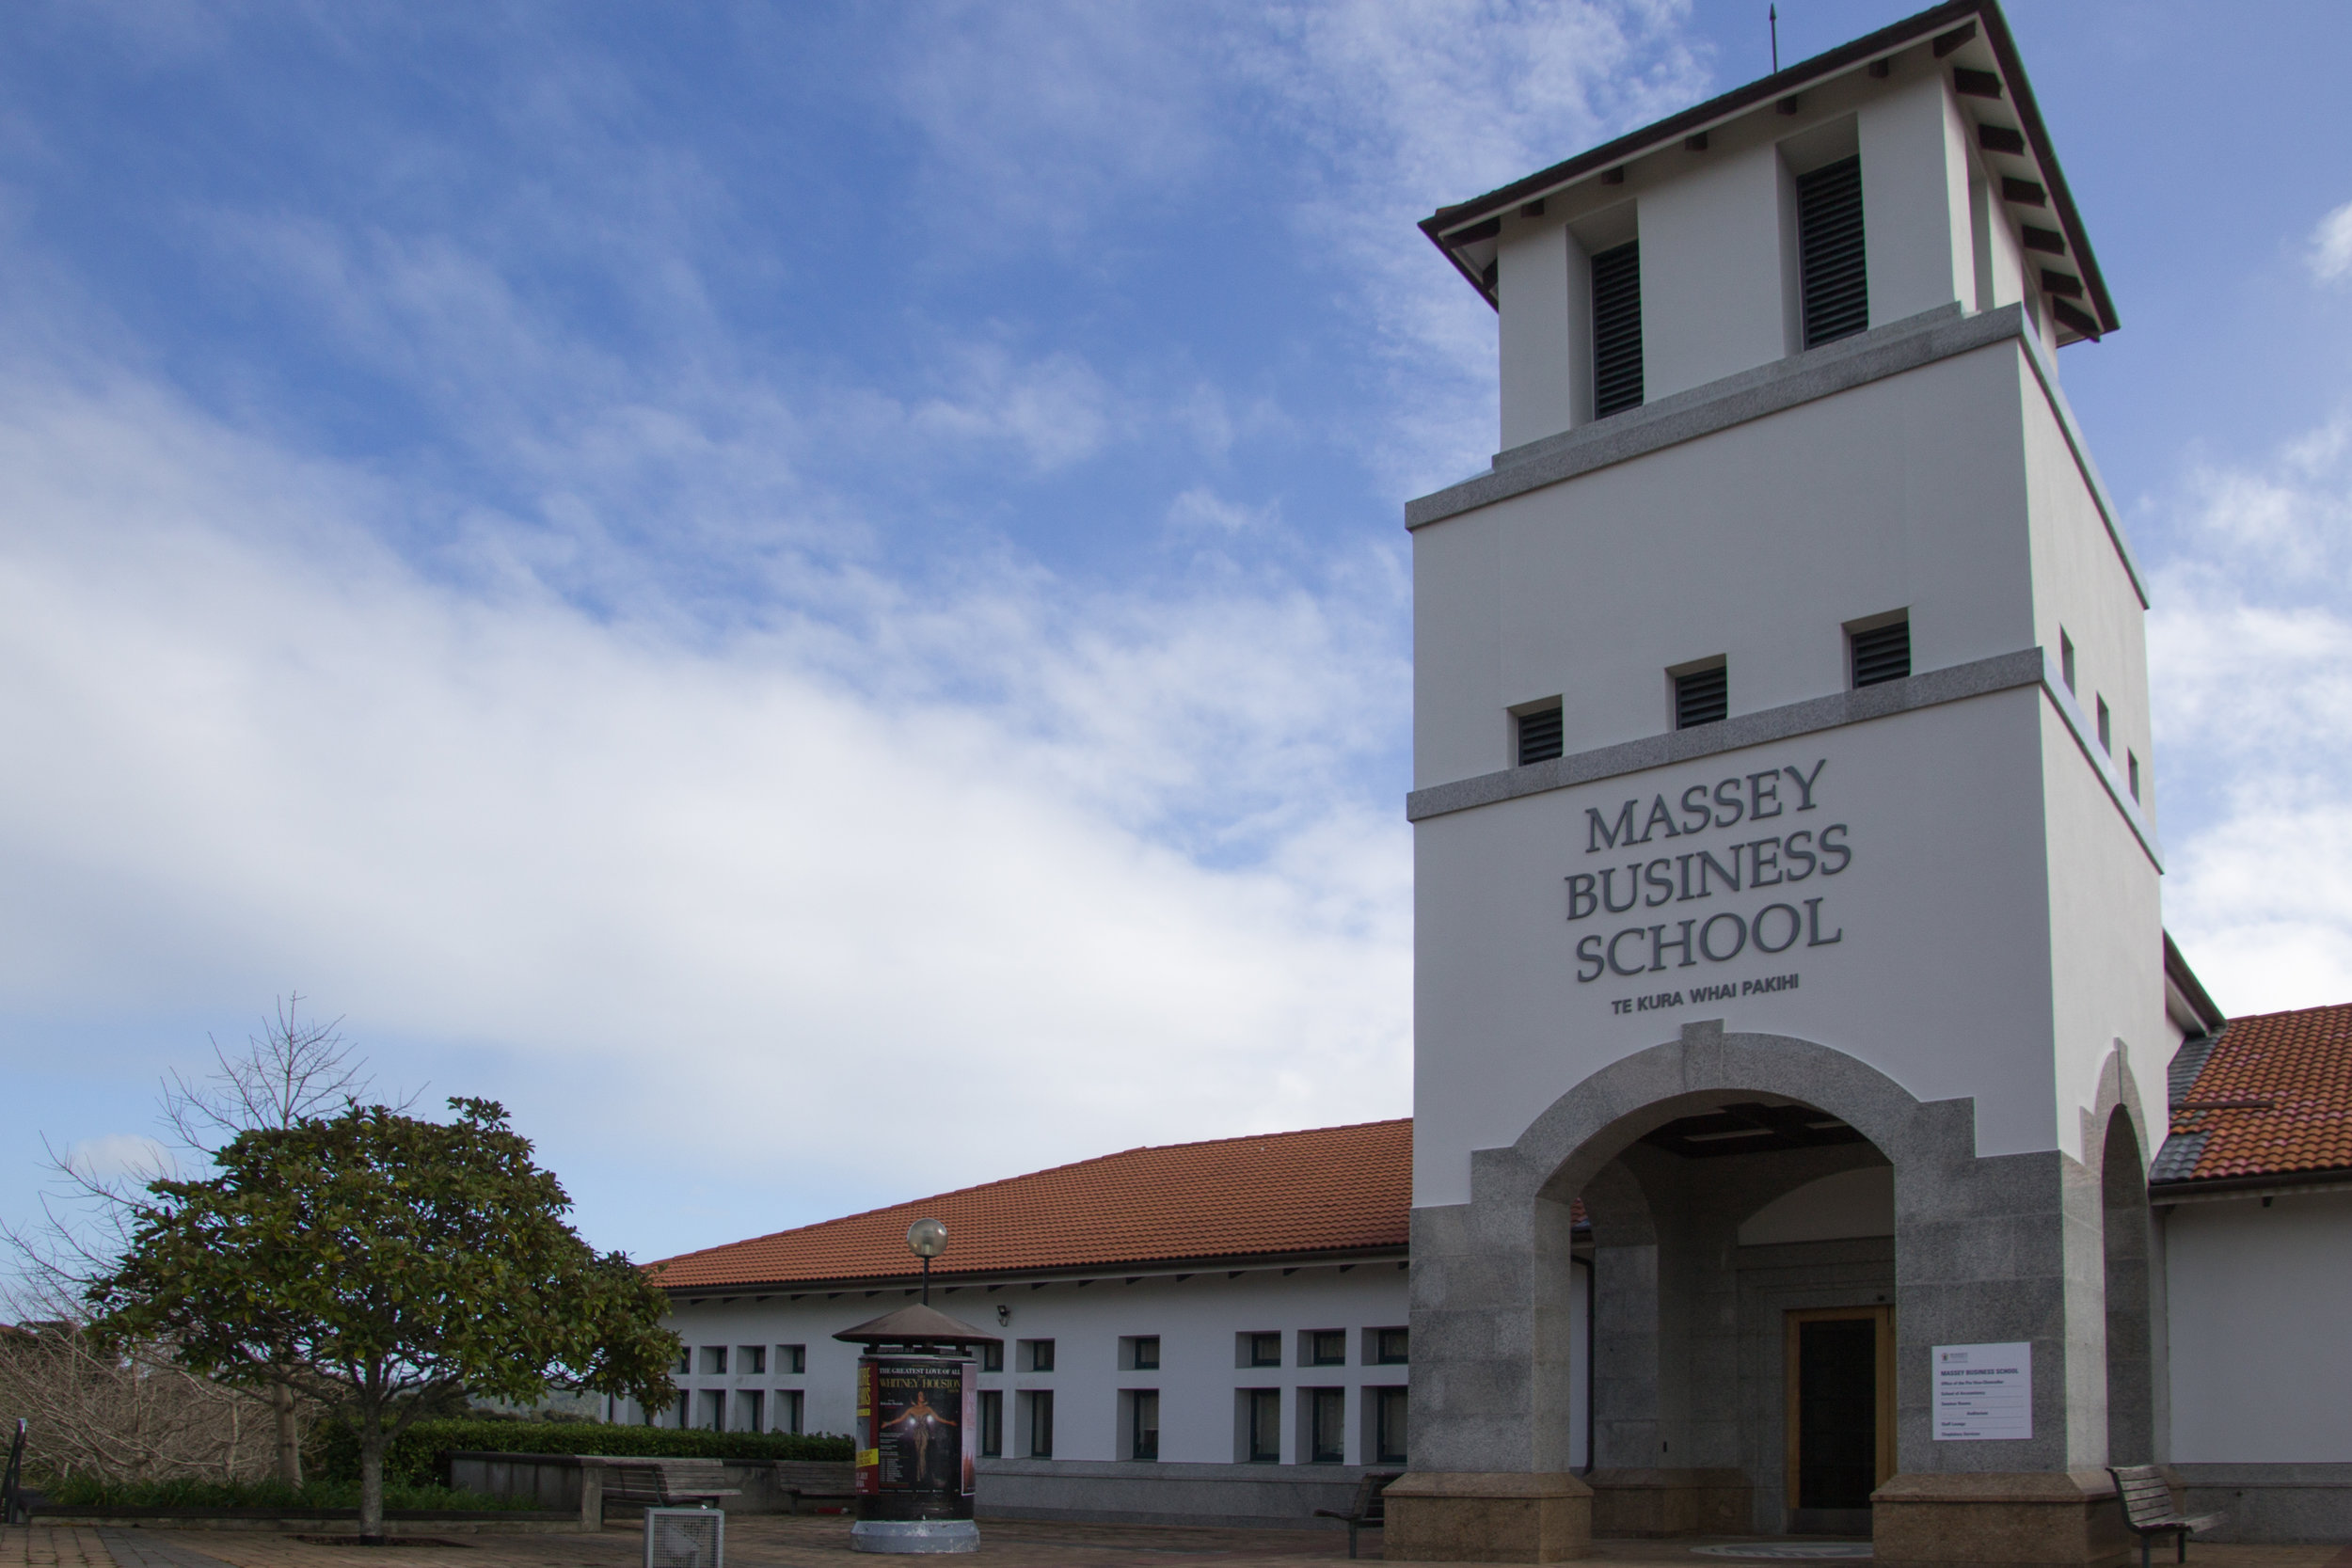 Copy of Massey Business School